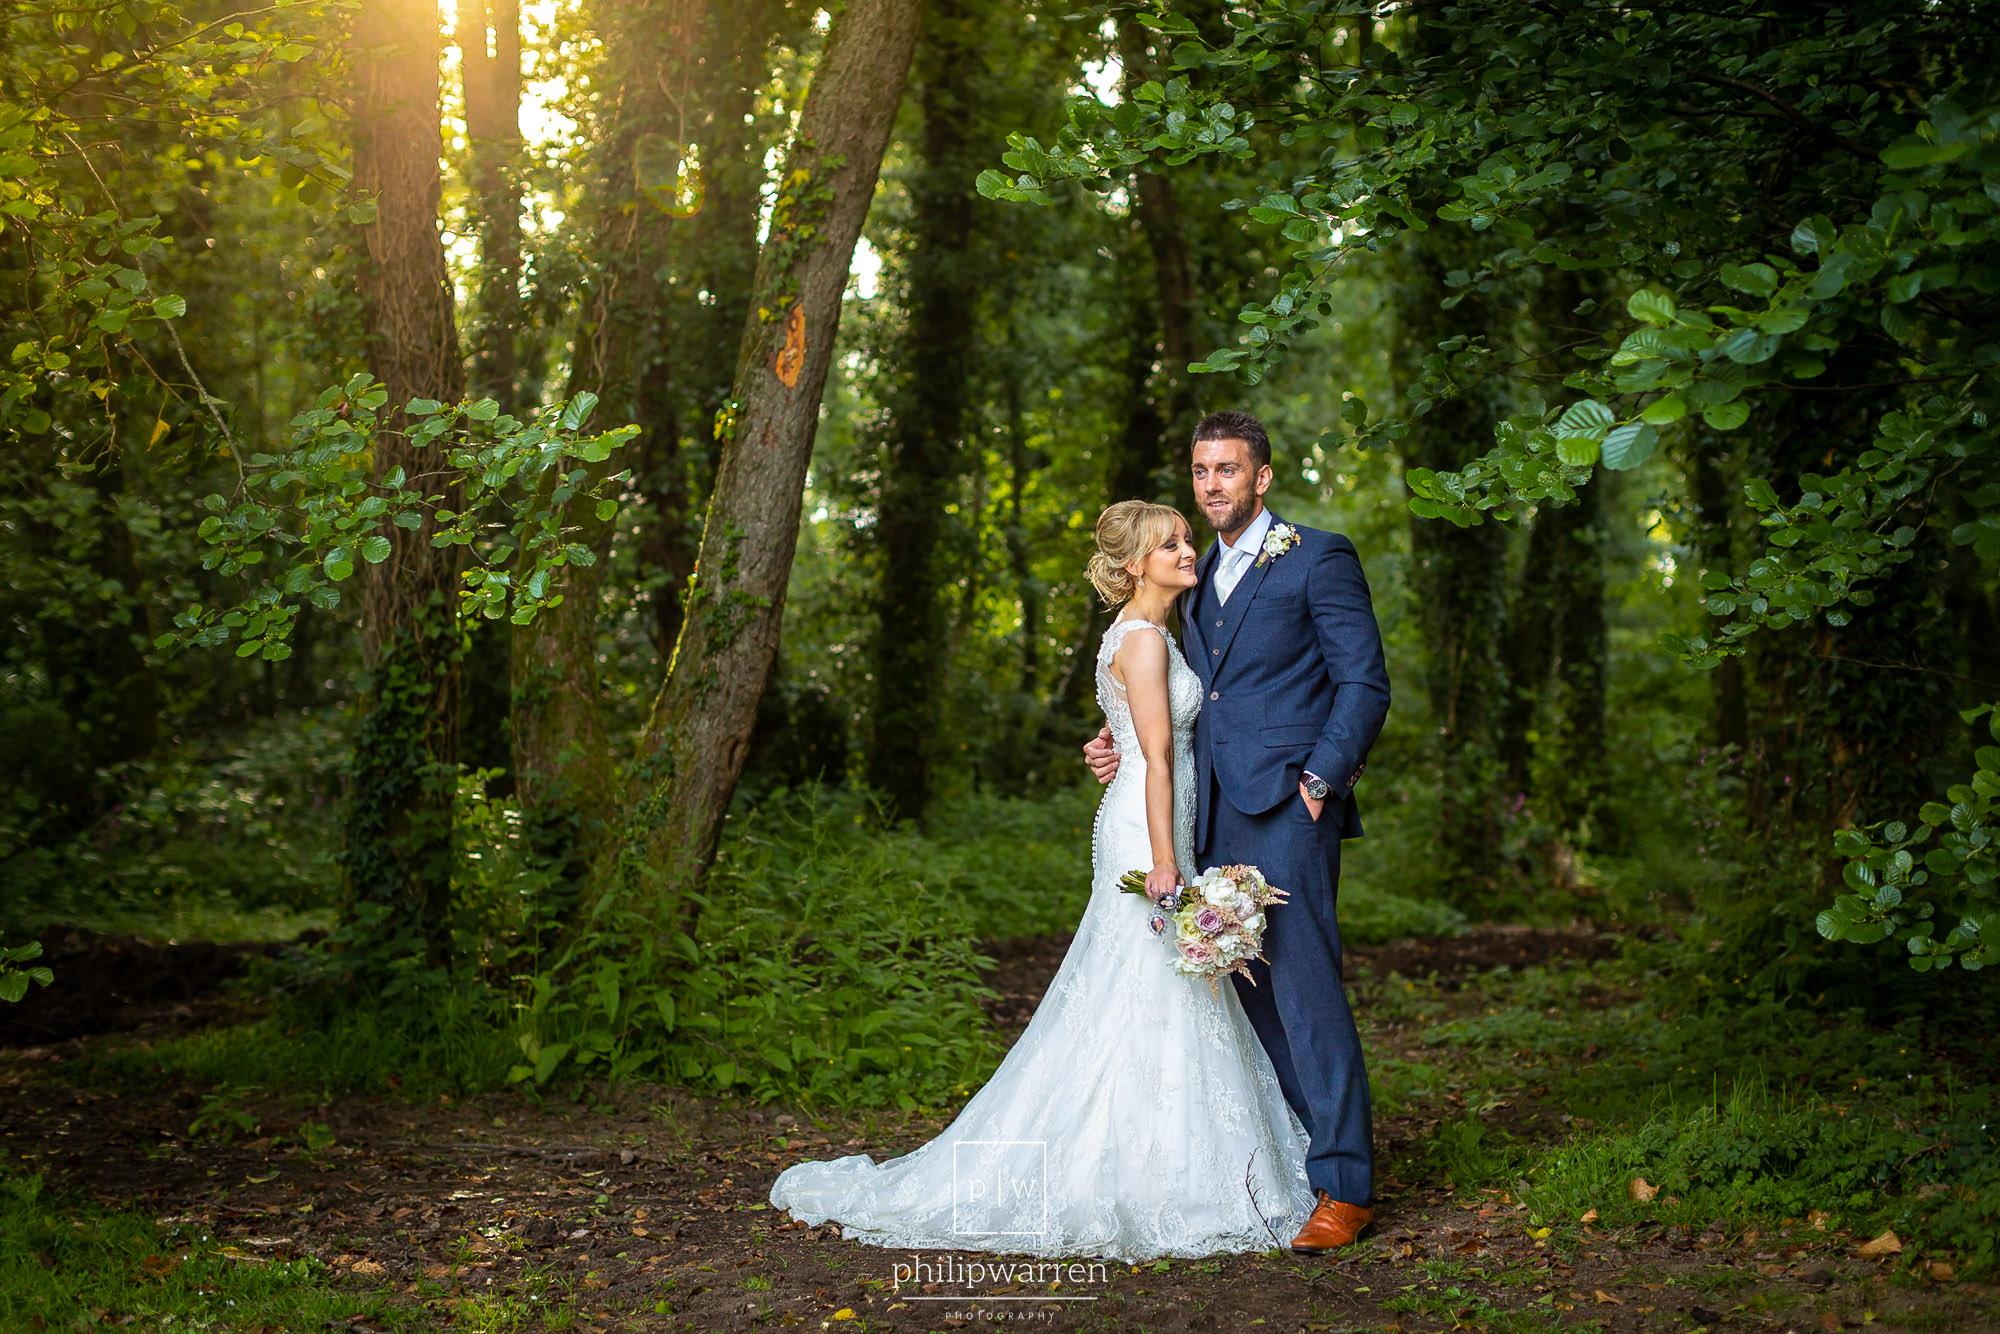 wedding photos in pencoed house estate woods